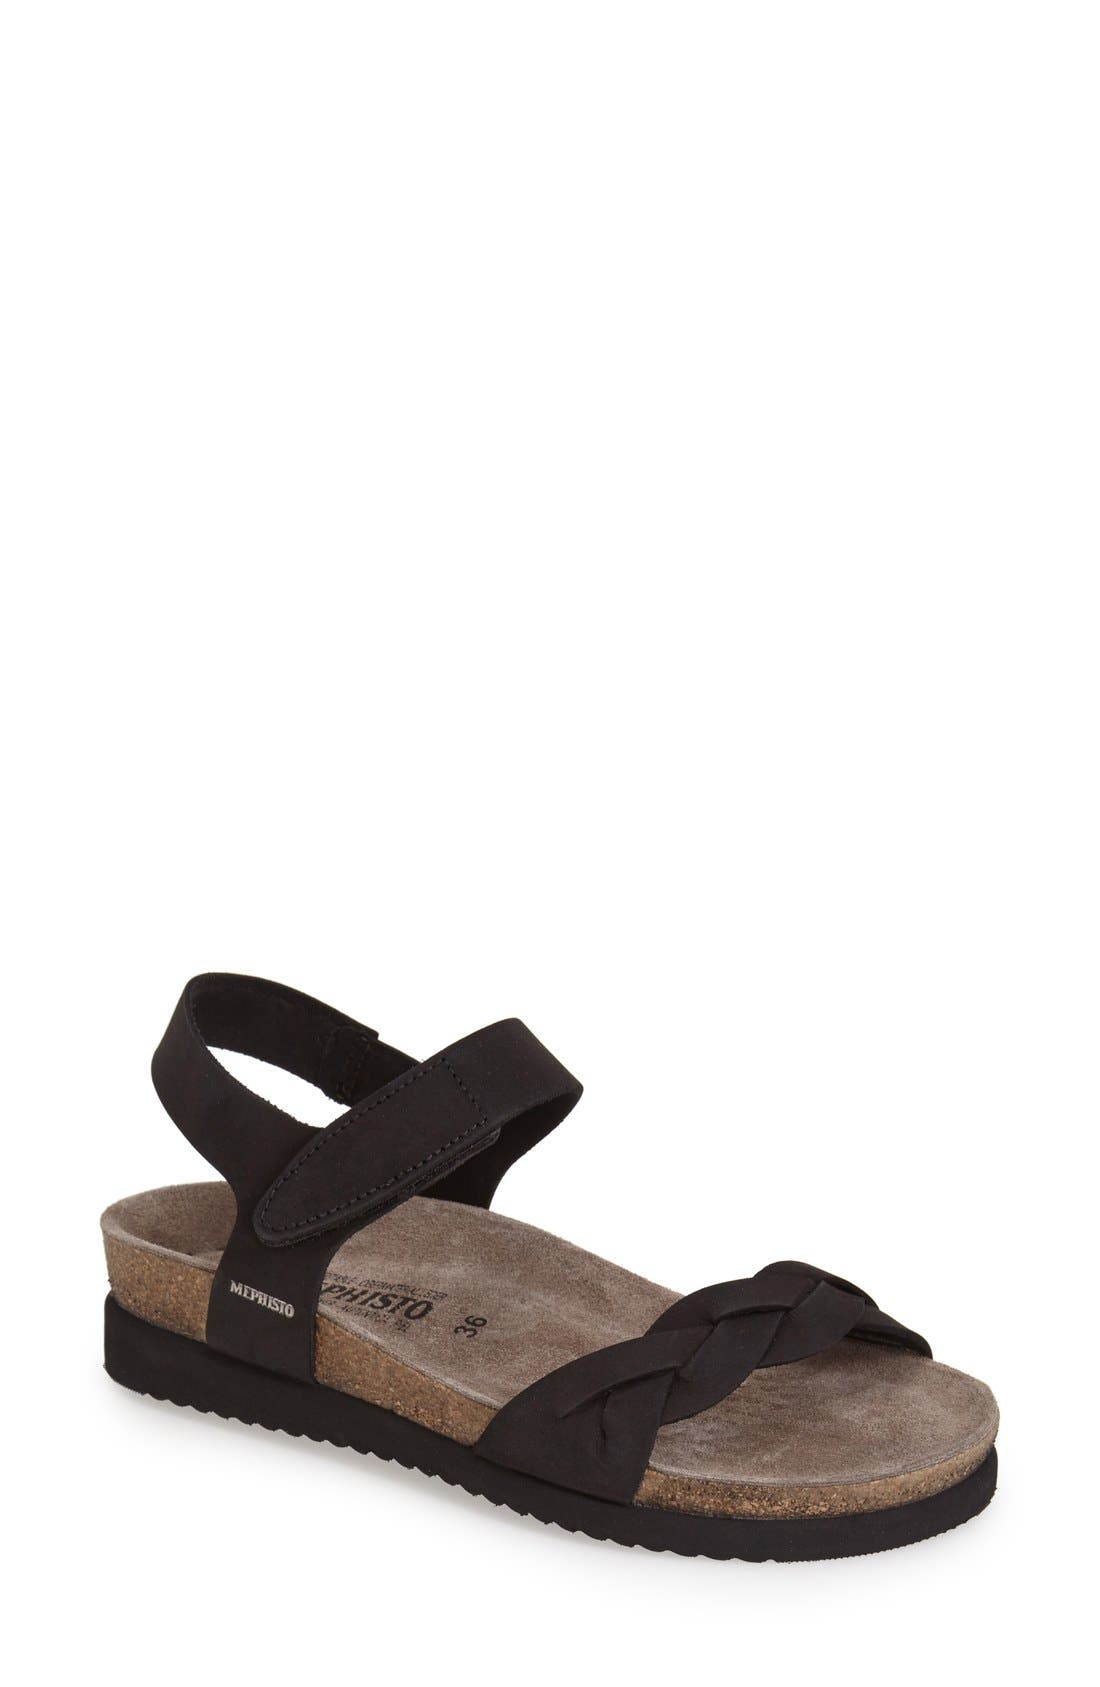 Alternate Image 1 Selected - Mephisto 'Honoria' Nubuck Leather Sandal (Women)